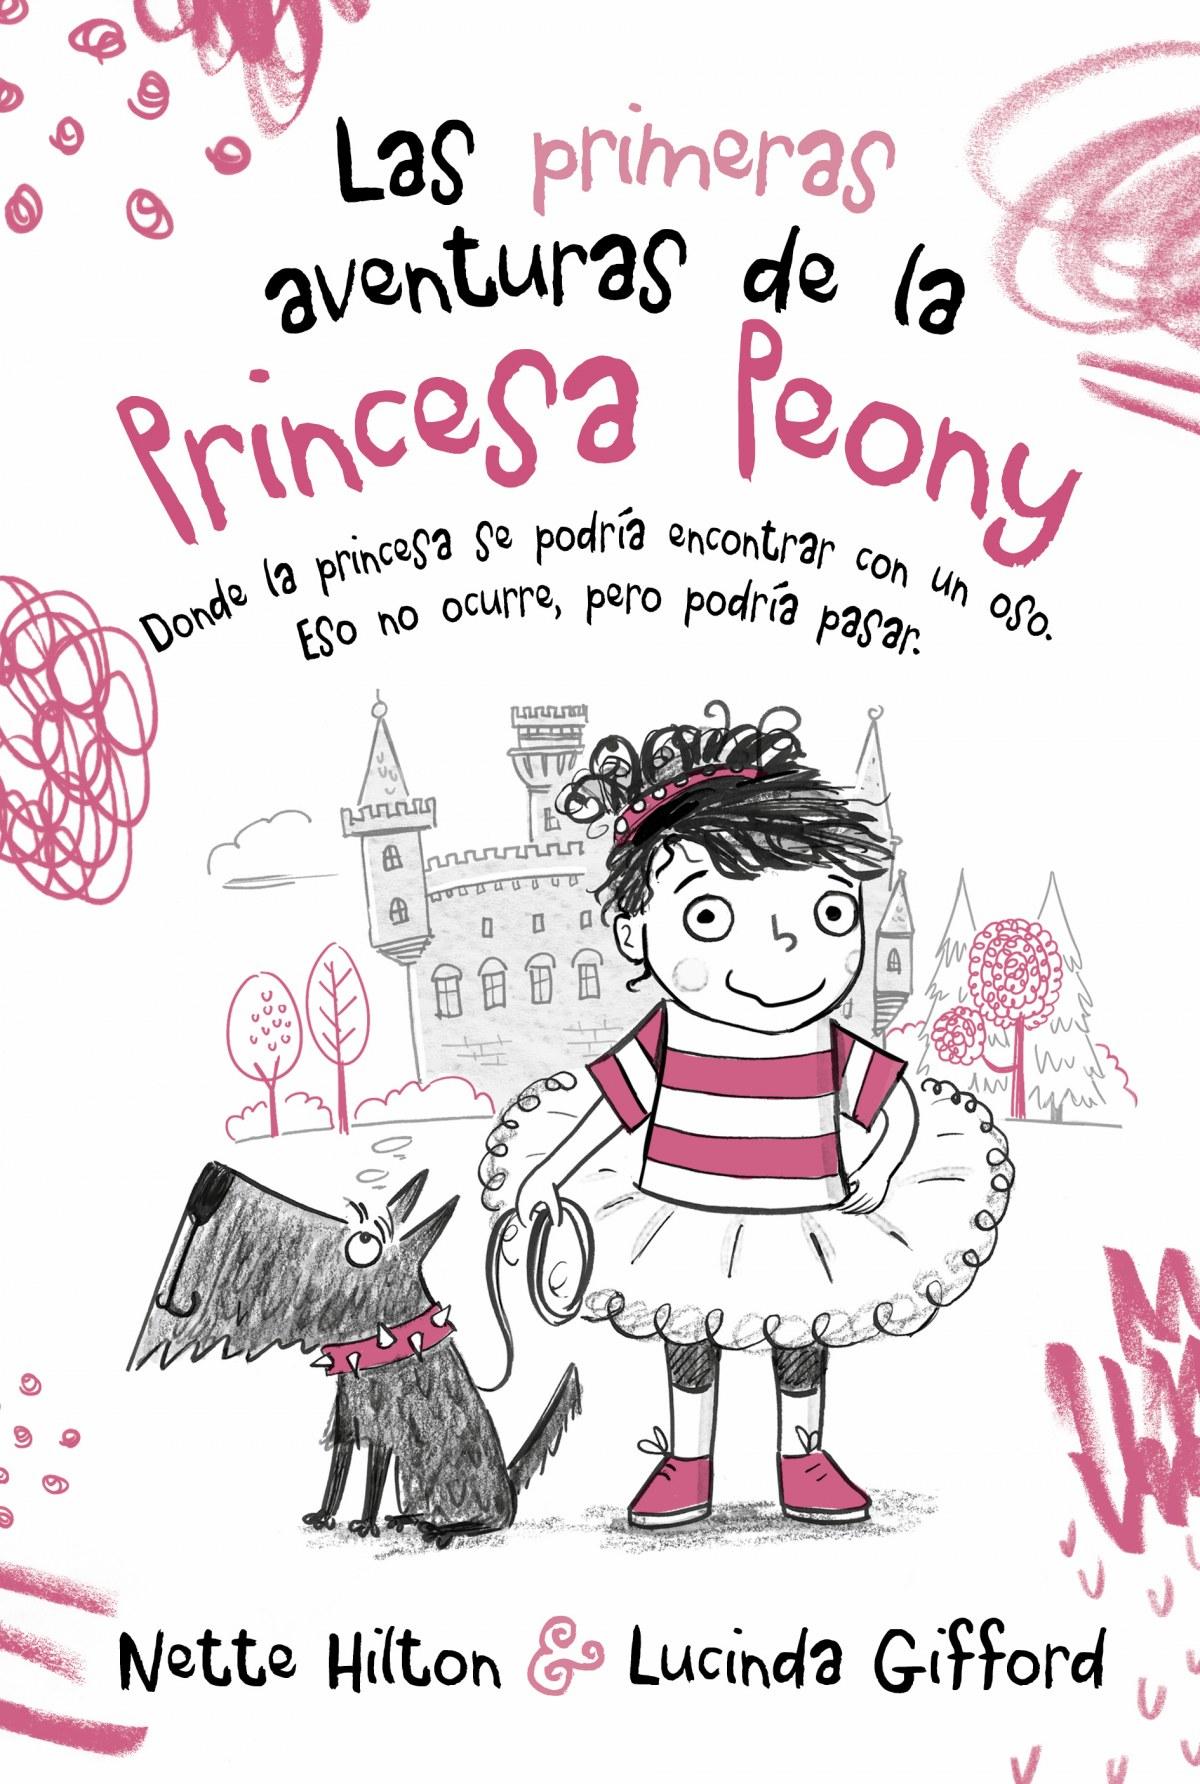 Las primeras aventuras de la Princesa Peony